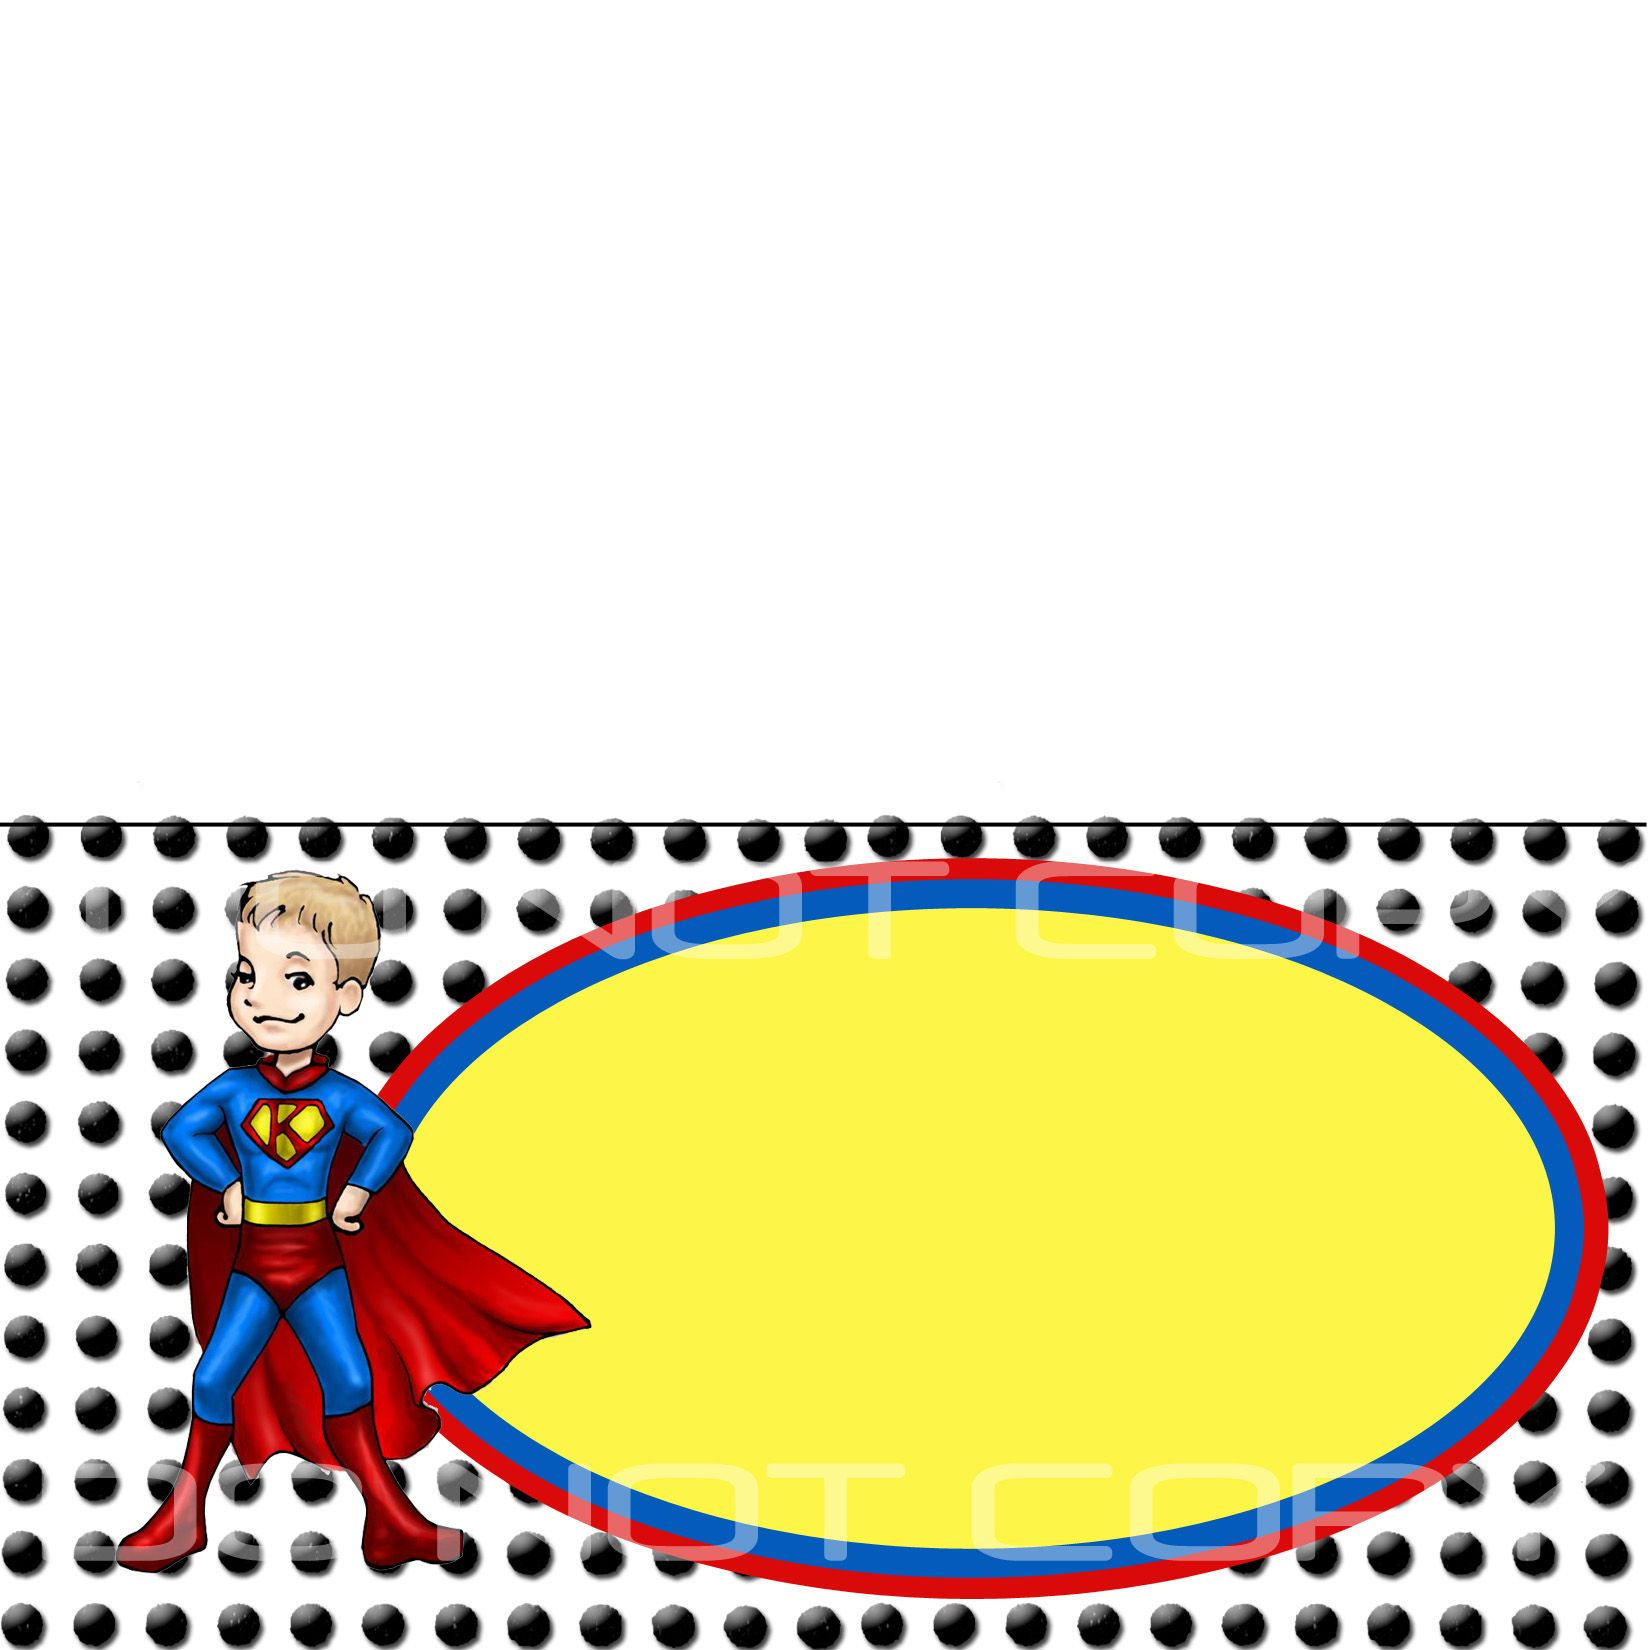 Superhero Place Card Easypeasy Superman Party